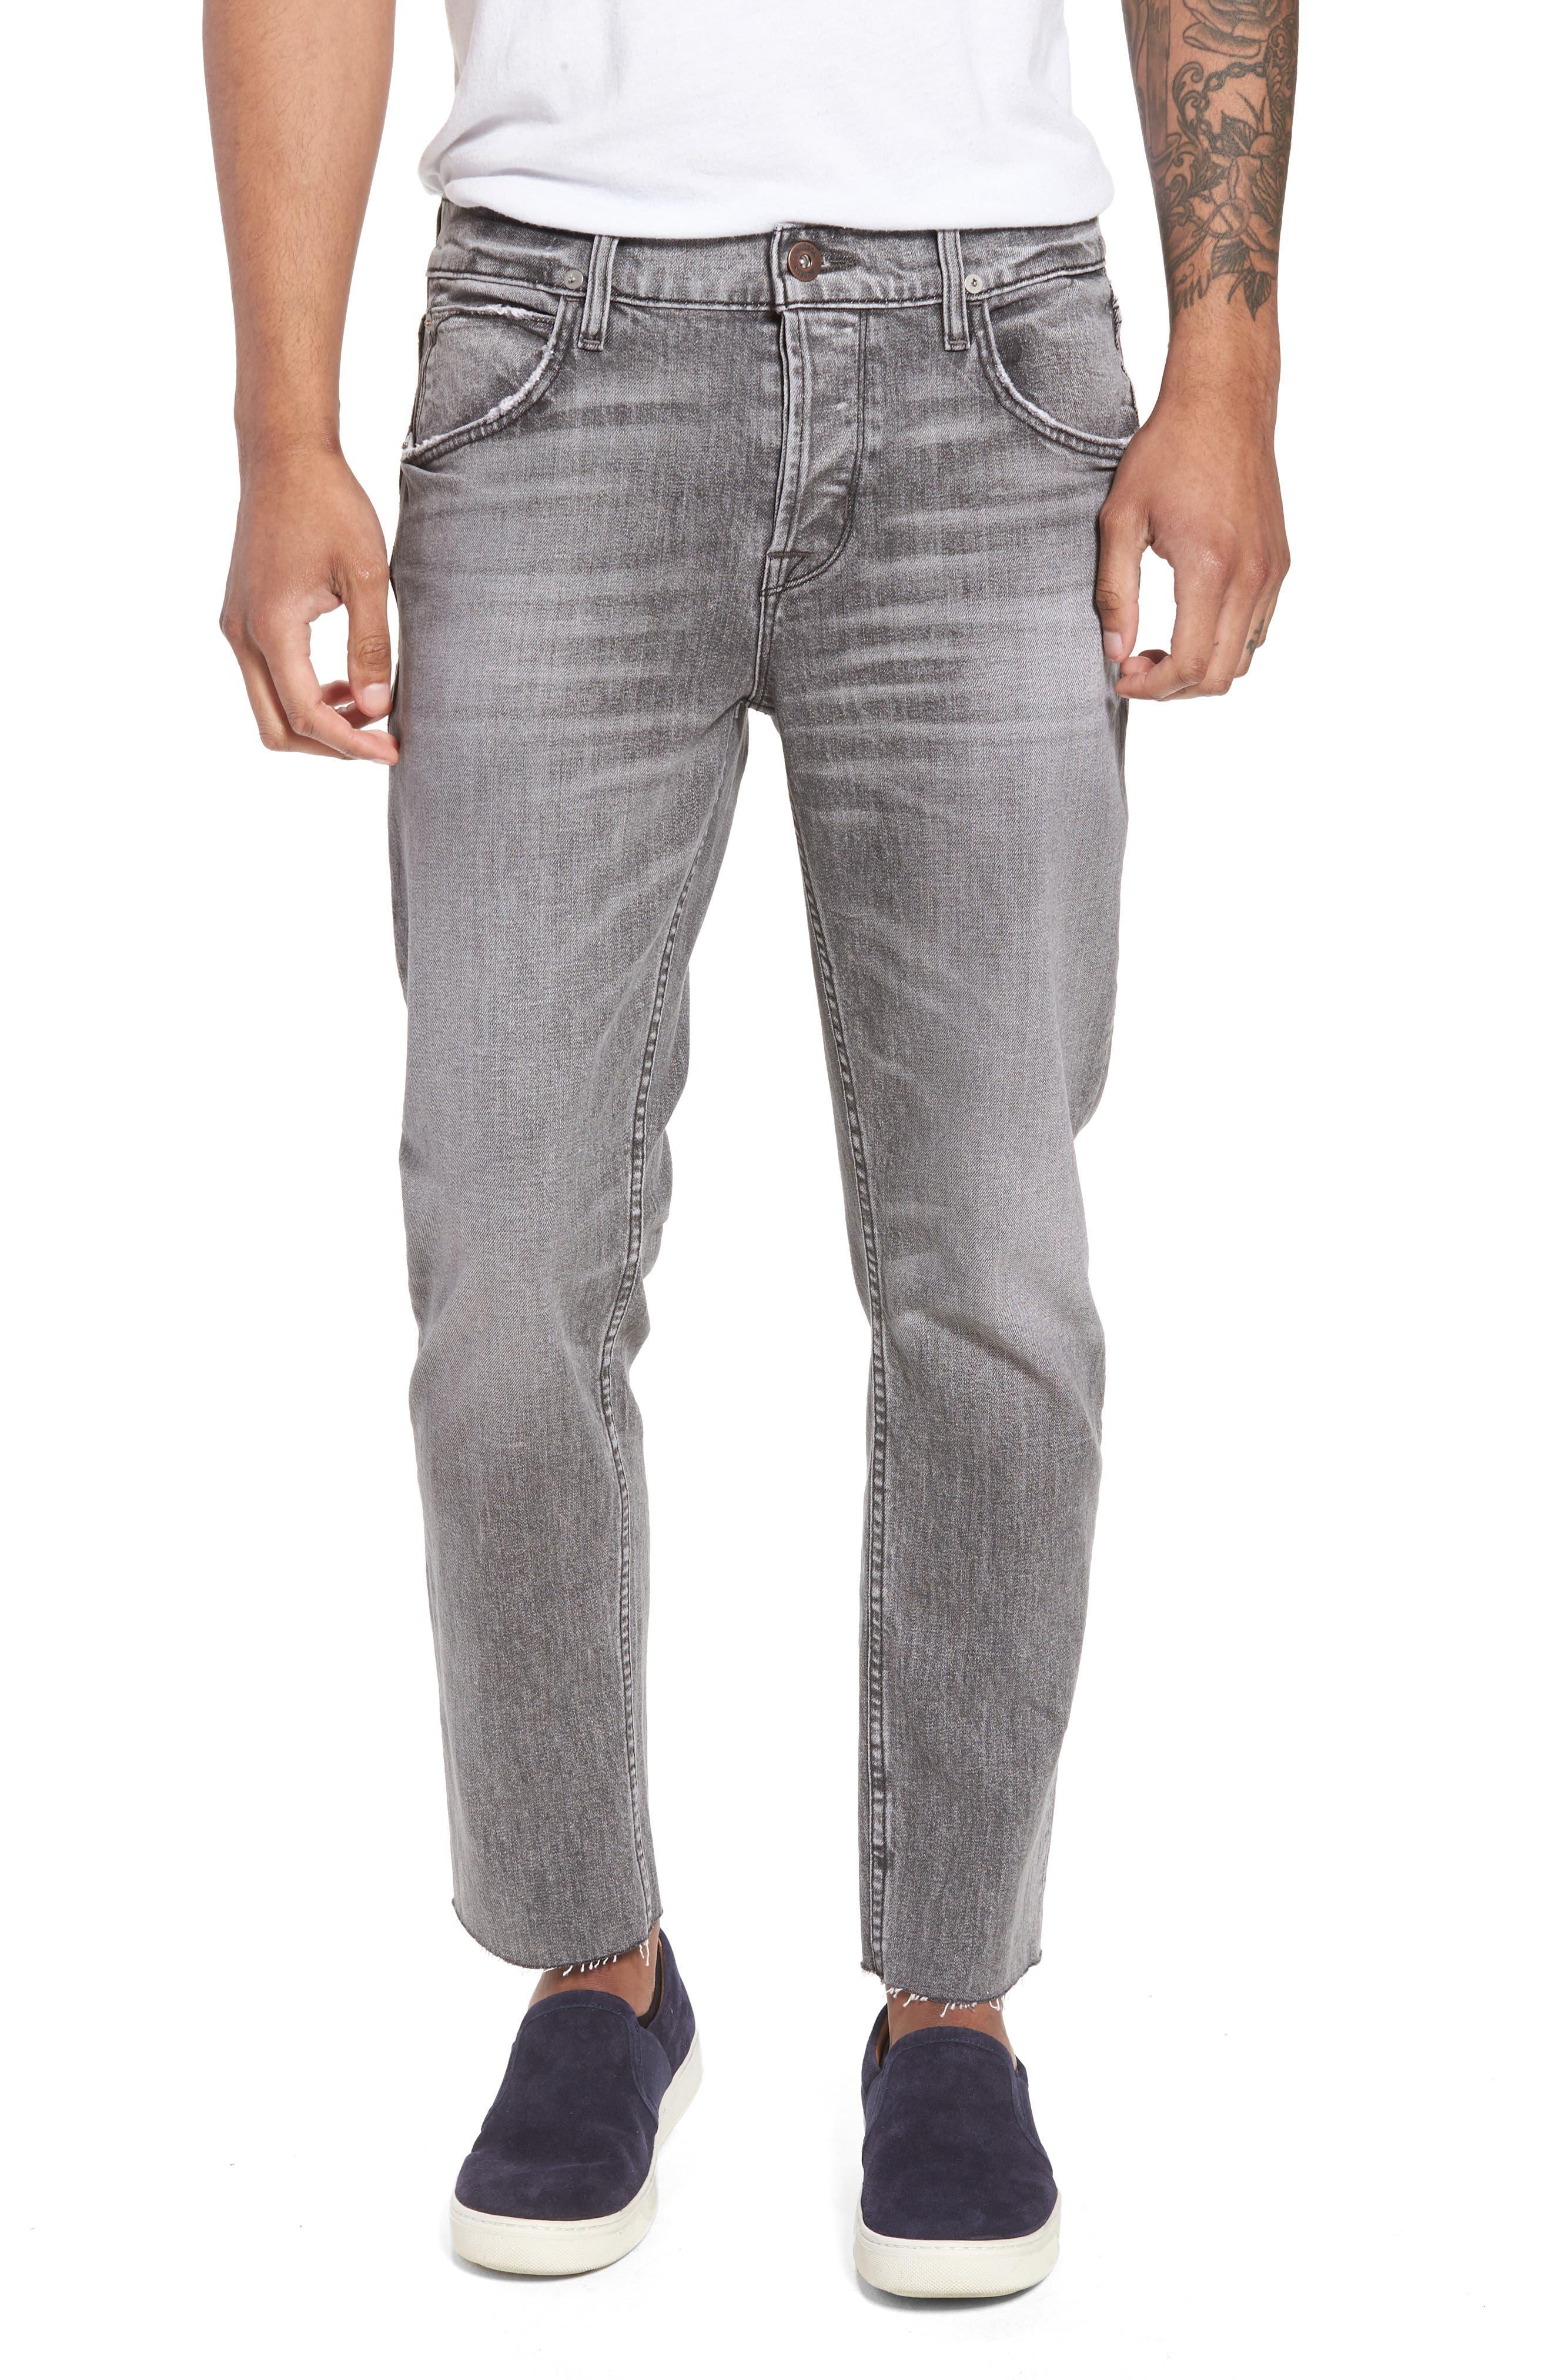 HUDSON JEANS,                             Blake Slim Fit Jeans,                             Main thumbnail 1, color,                             063